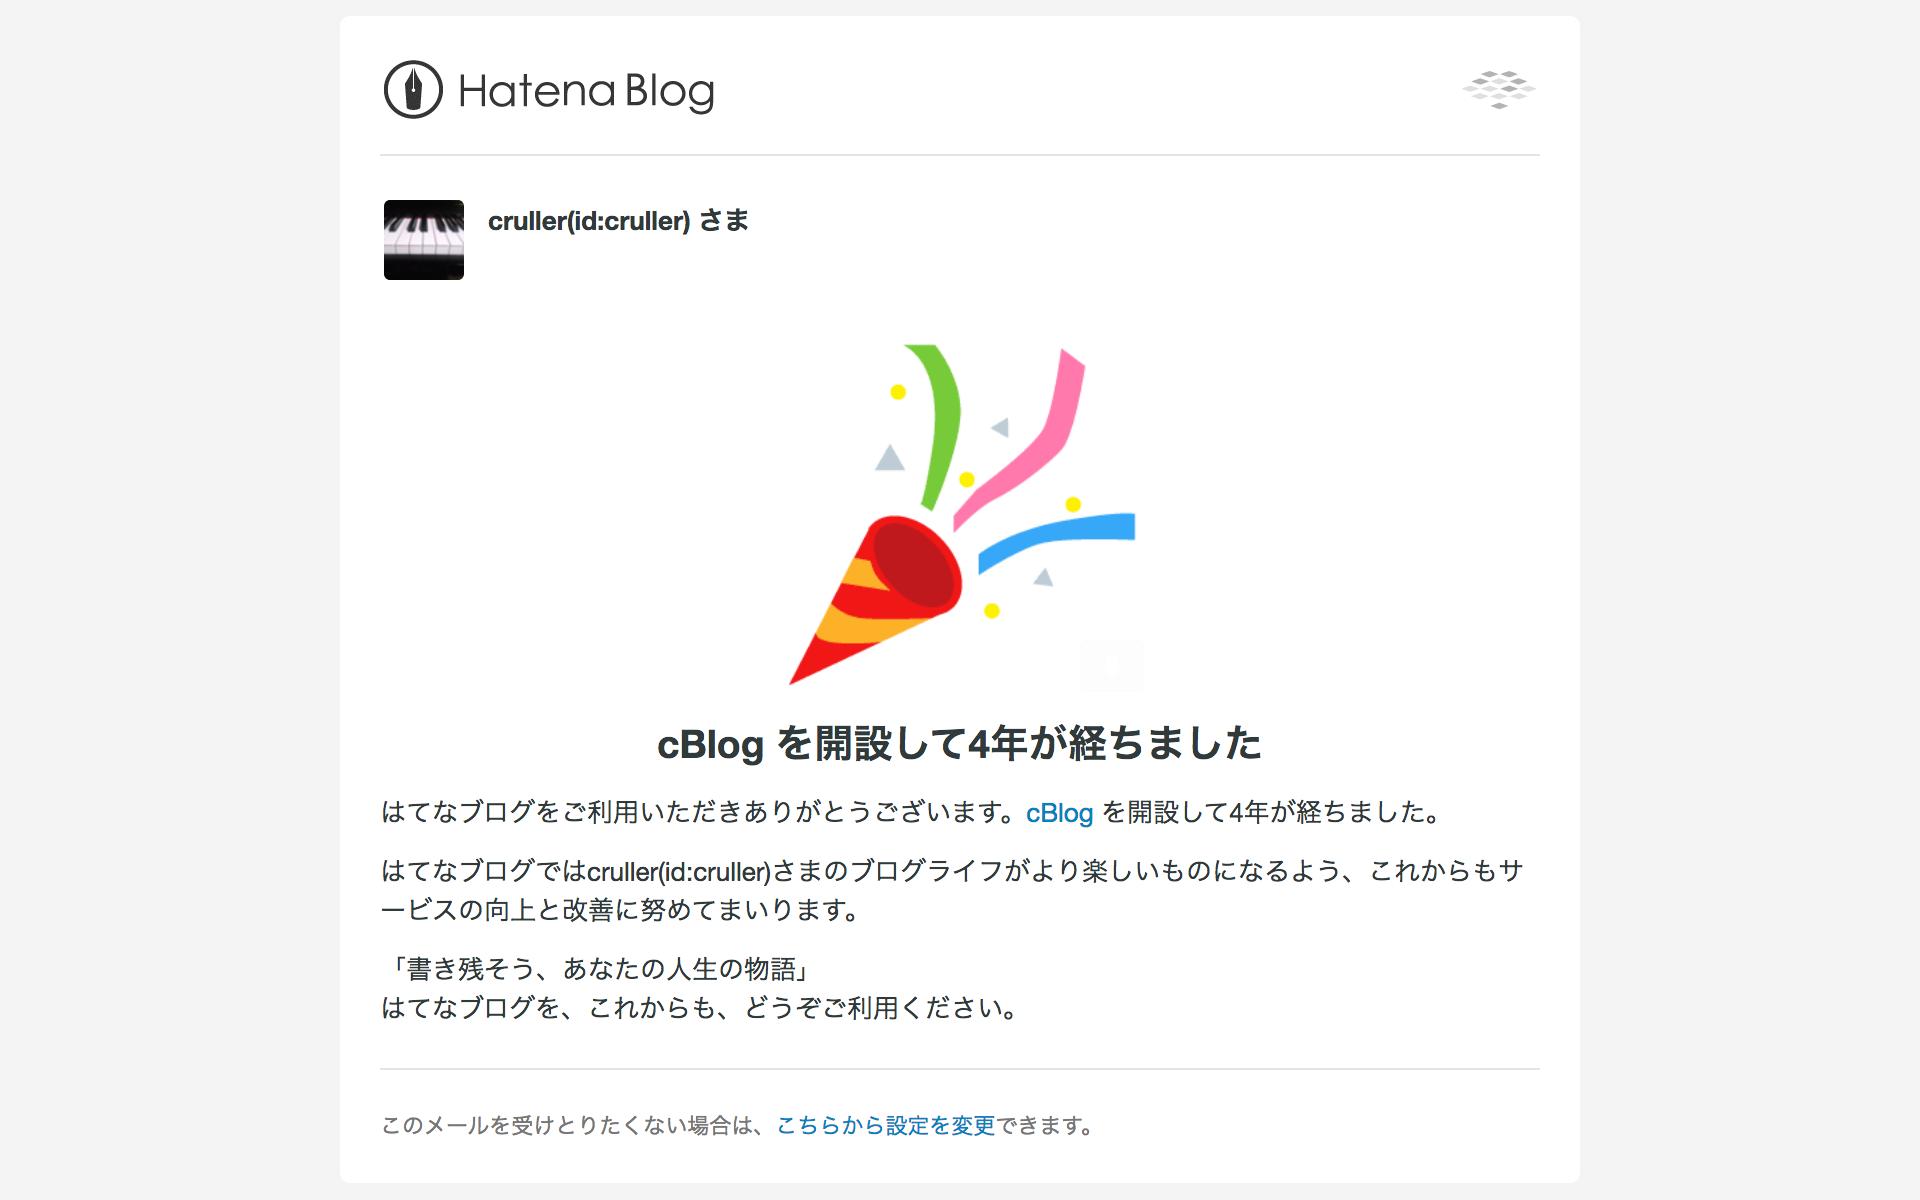 cBlog開設4年